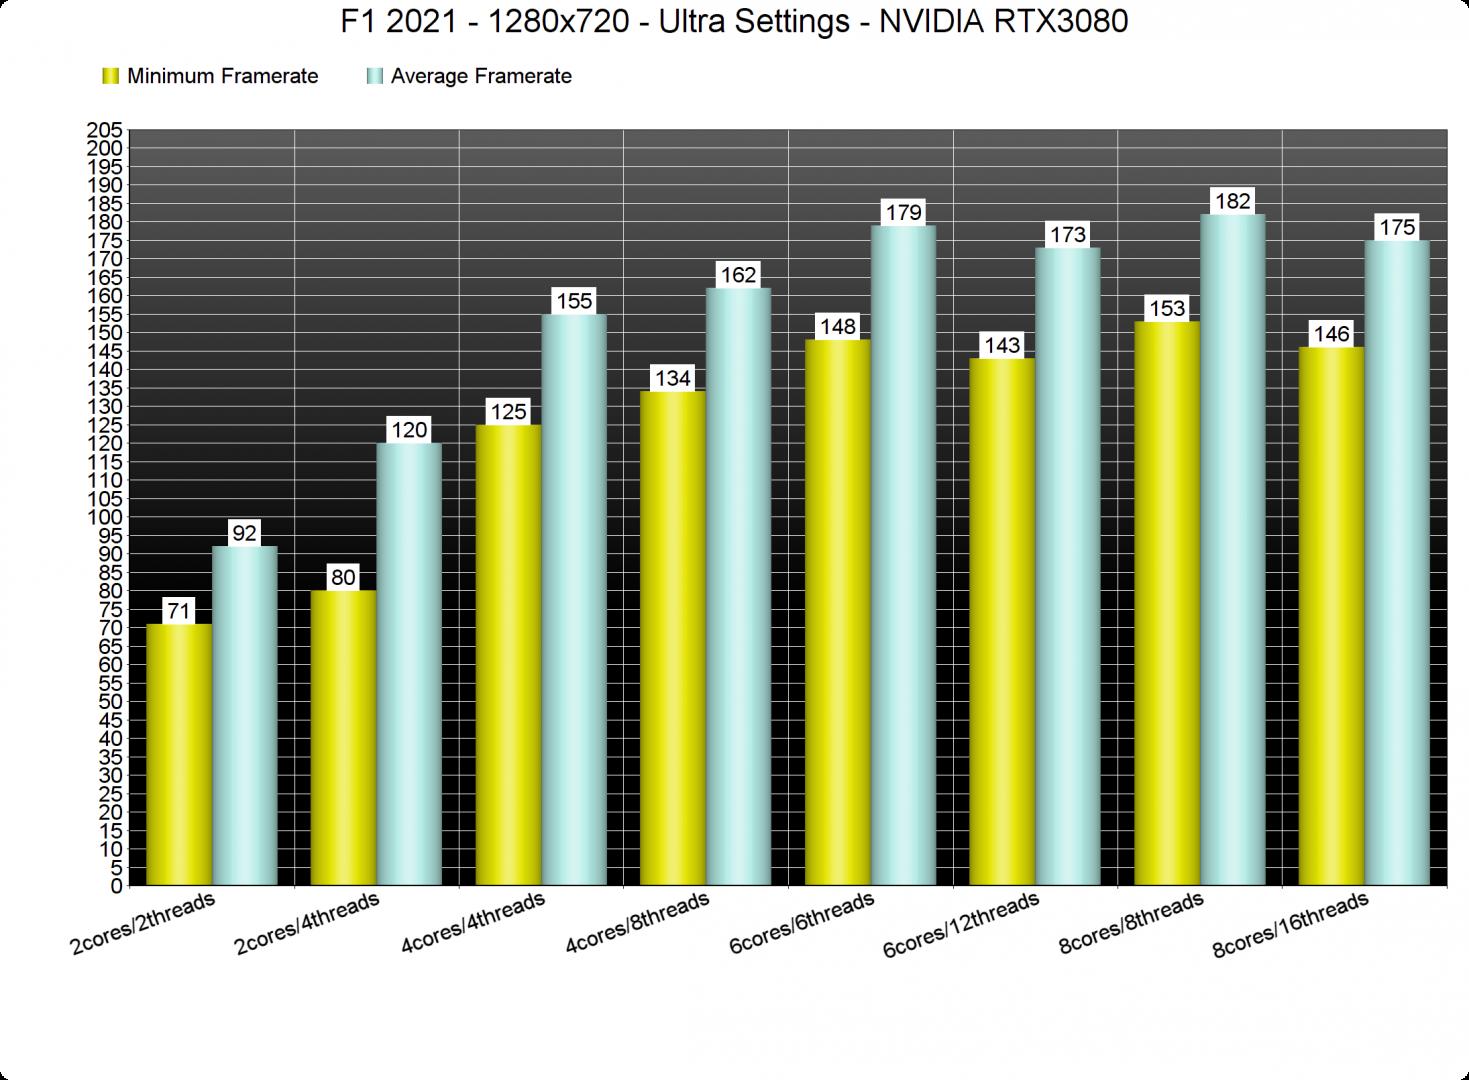 F1 2021 CPU benchmarks